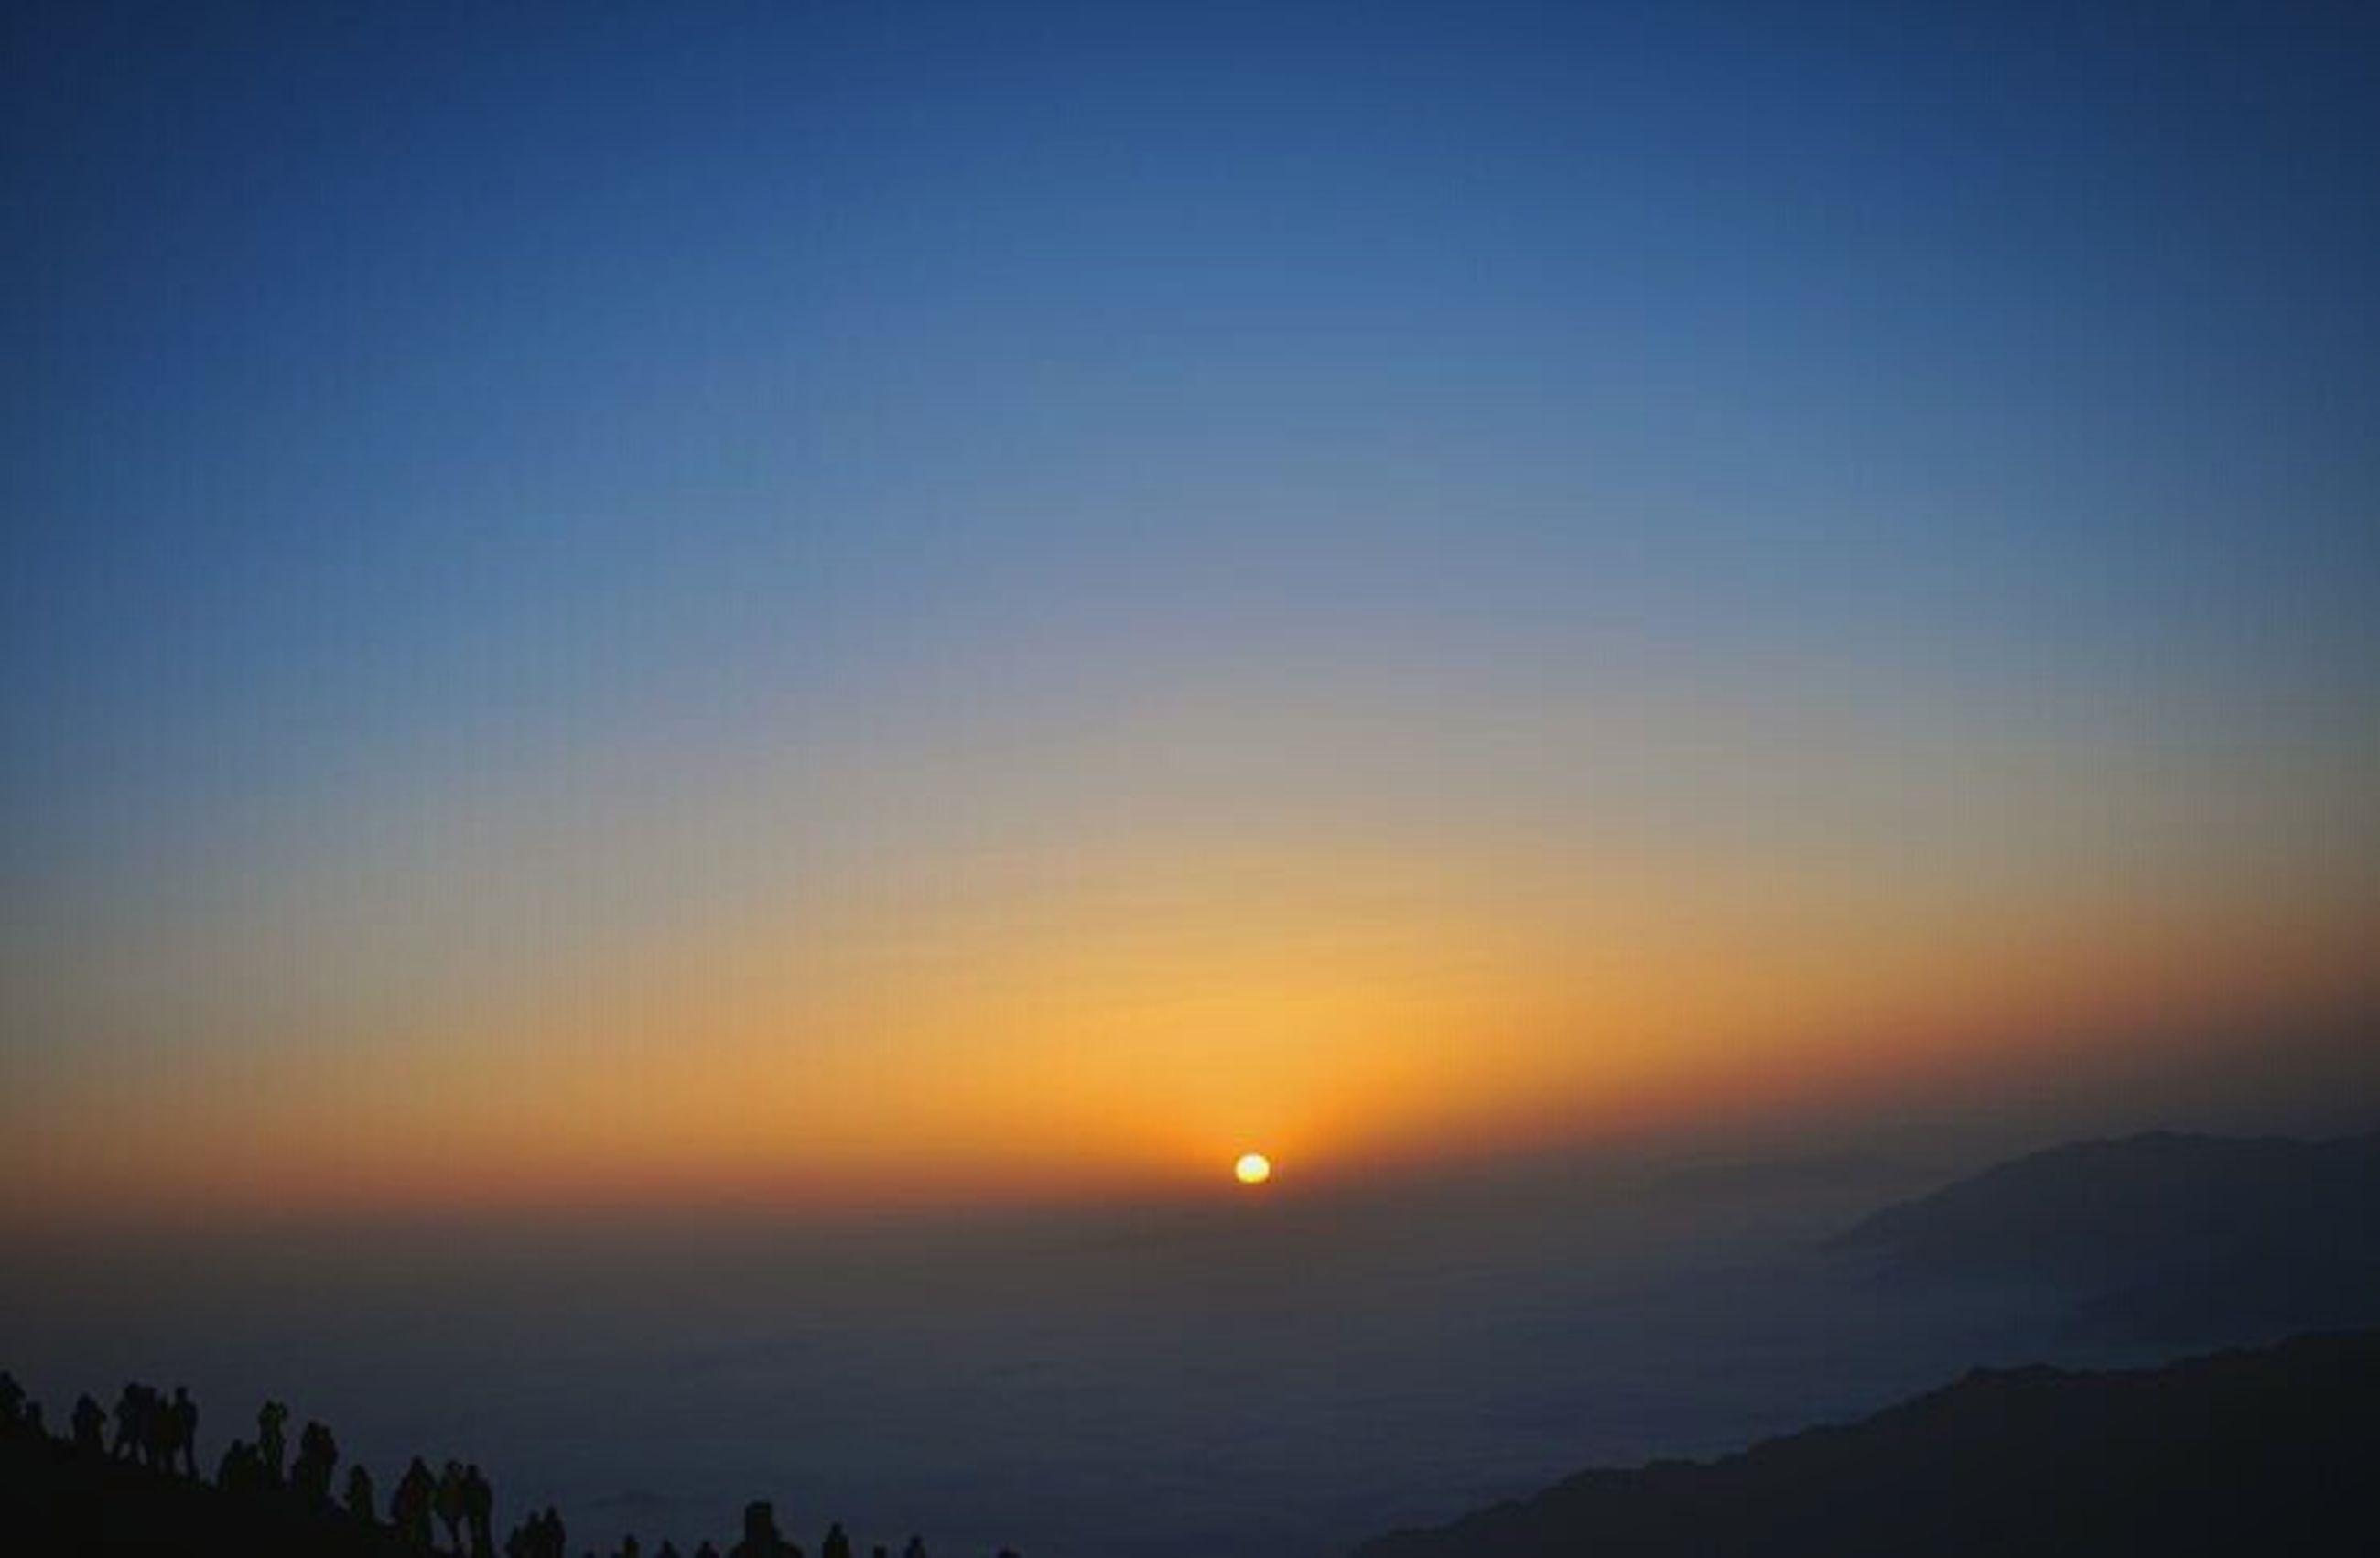 sunset, scenics, tranquil scene, silhouette, tranquility, beauty in nature, sun, copy space, orange color, idyllic, nature, clear sky, mountain, sky, landscape, sunlight, dusk, blue, outdoors, majestic